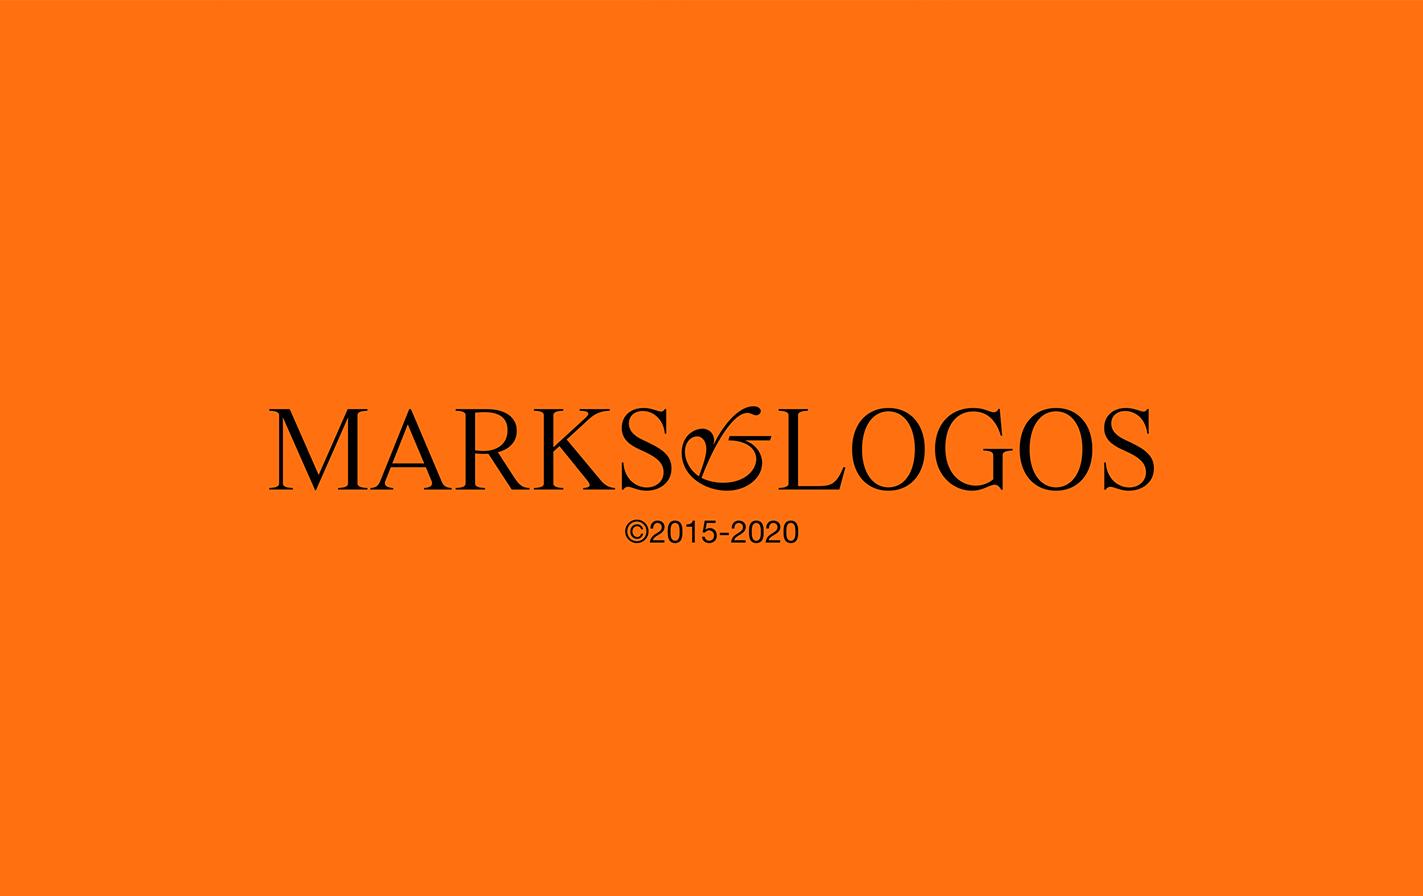 Marks & logos 2015-2020